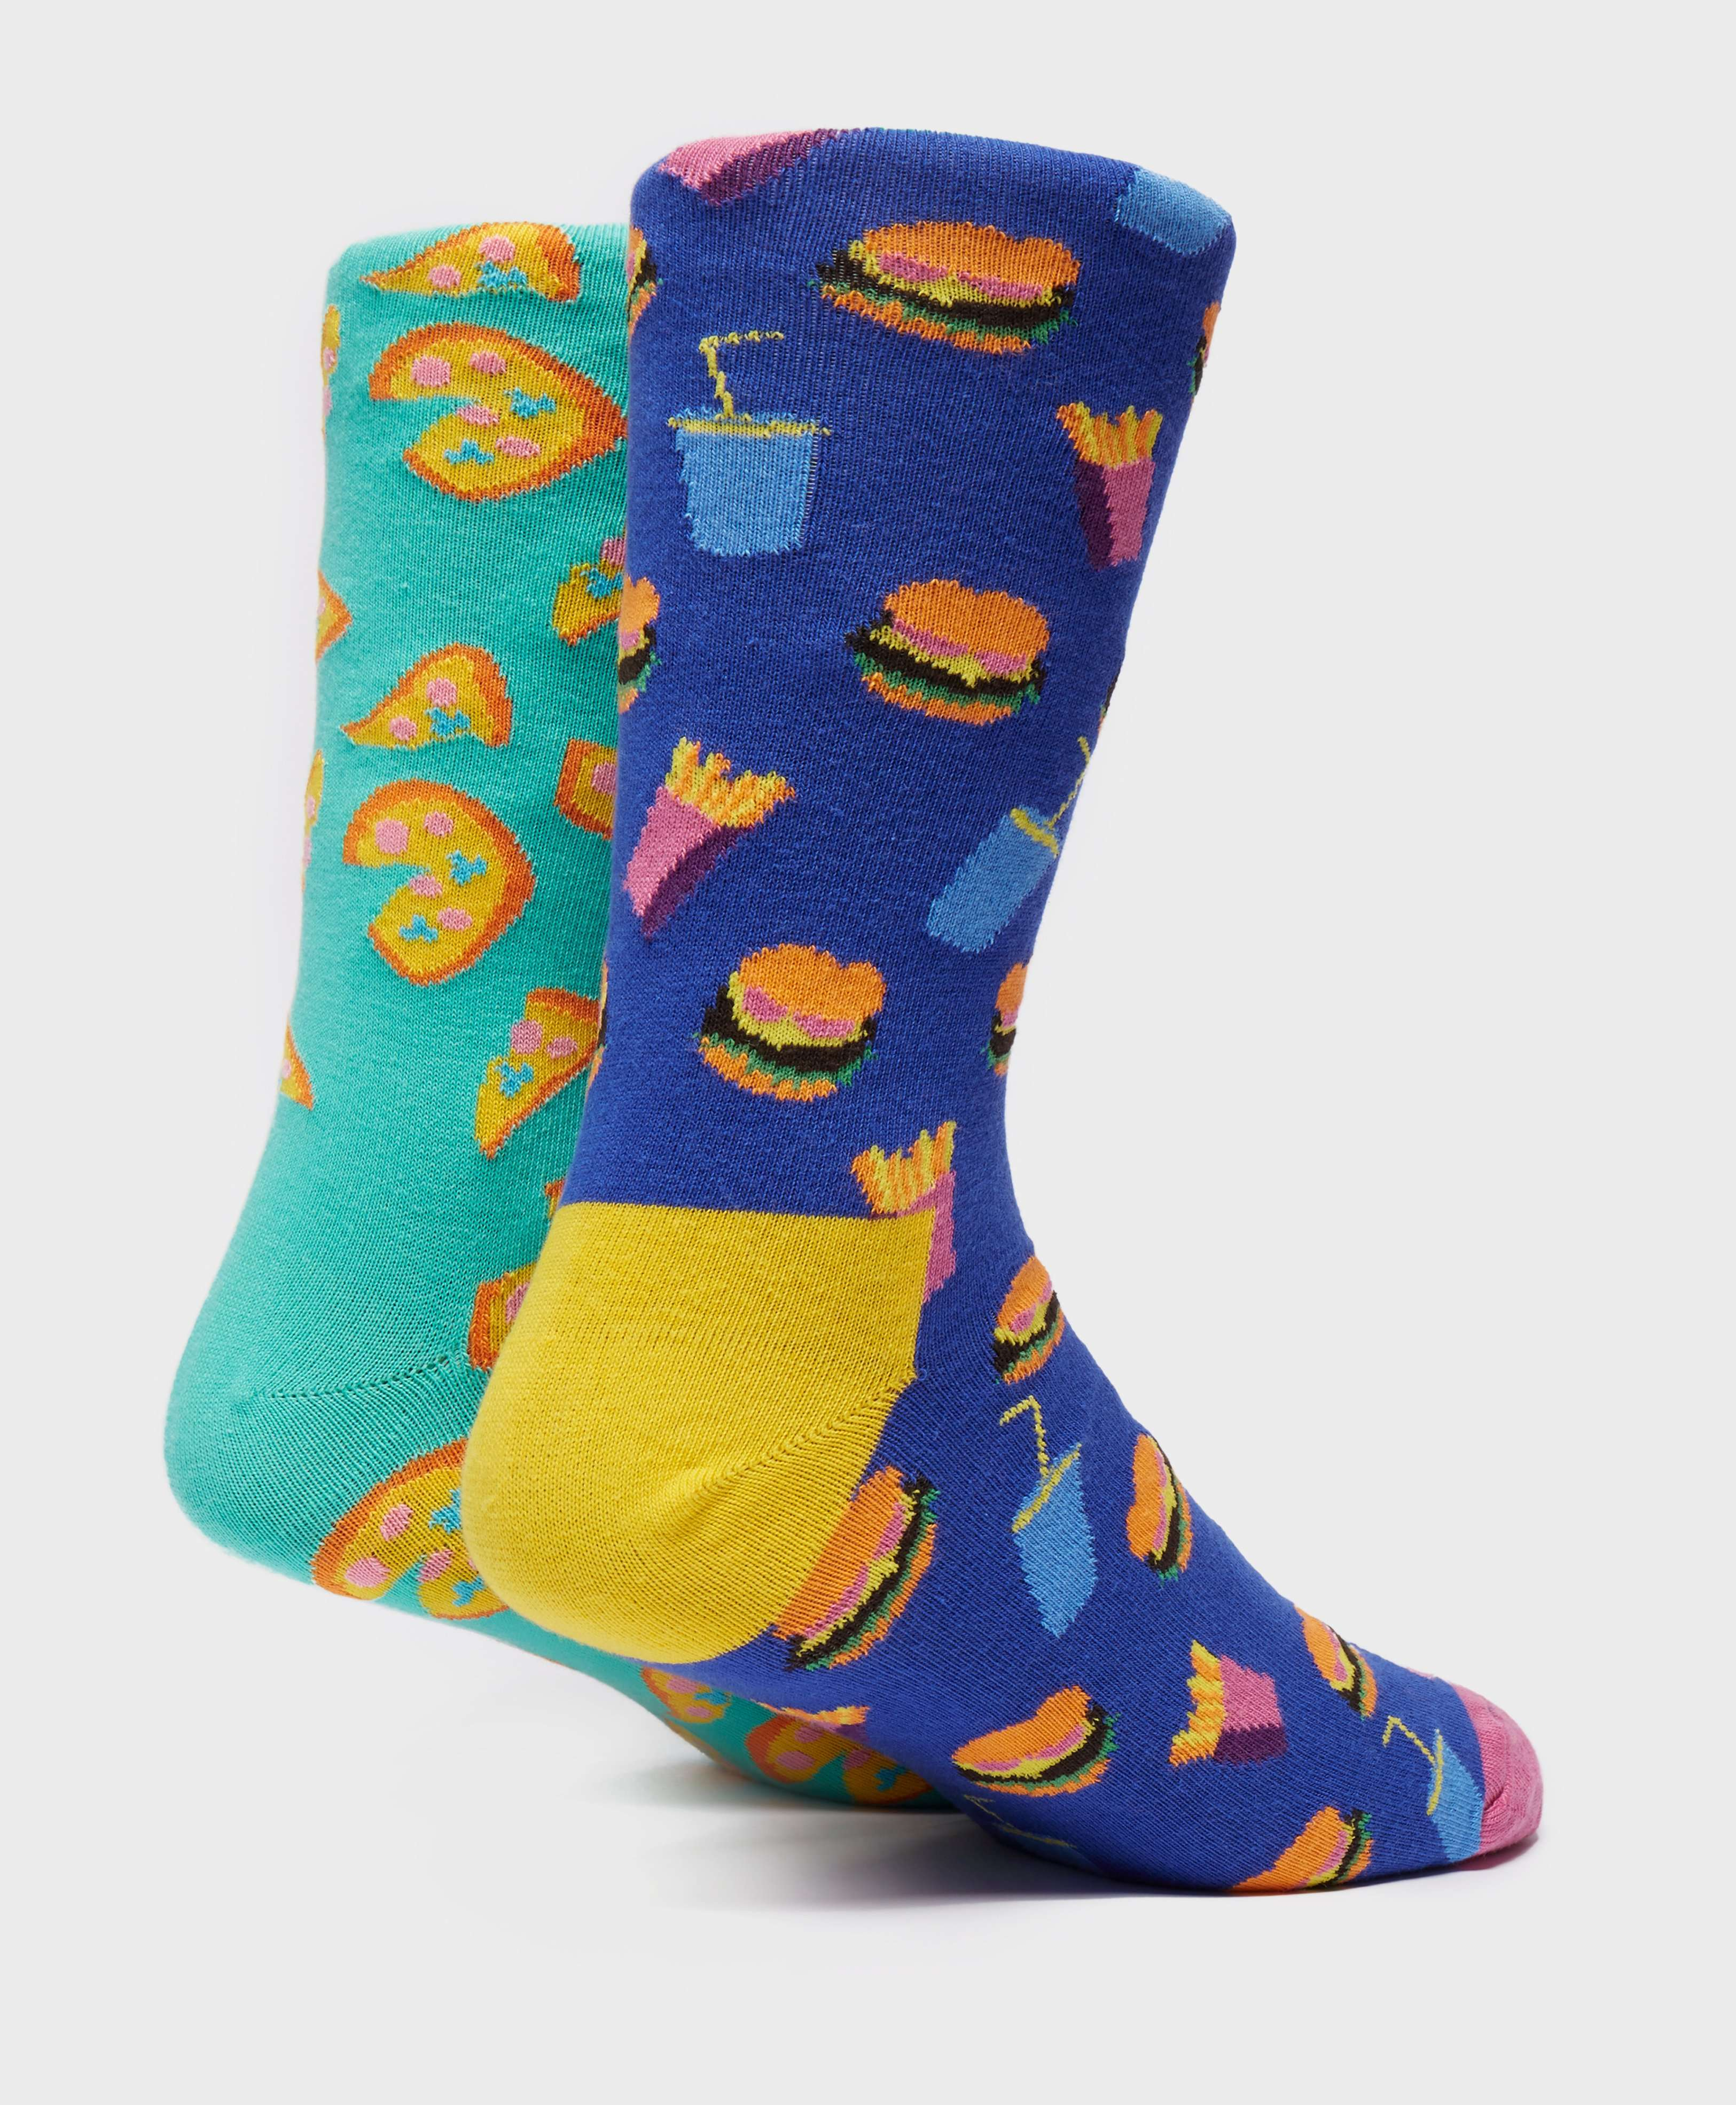 Happy Socks 4-Pack Junk Food Socks